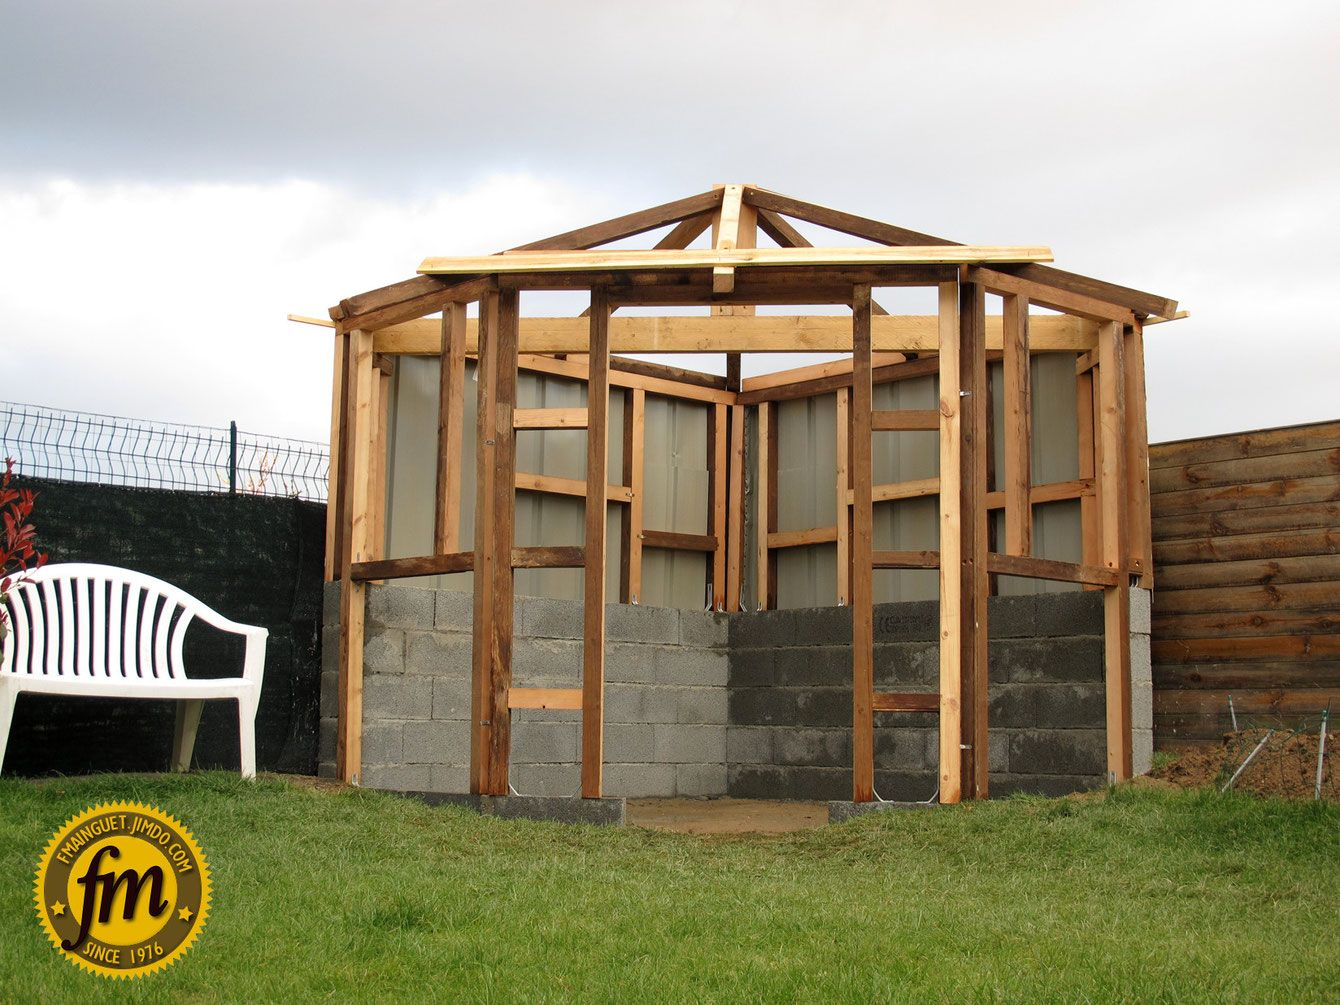 charpente cabane de jardin d 39 angle jardin pinterest charpente angles et abris de jardin. Black Bedroom Furniture Sets. Home Design Ideas